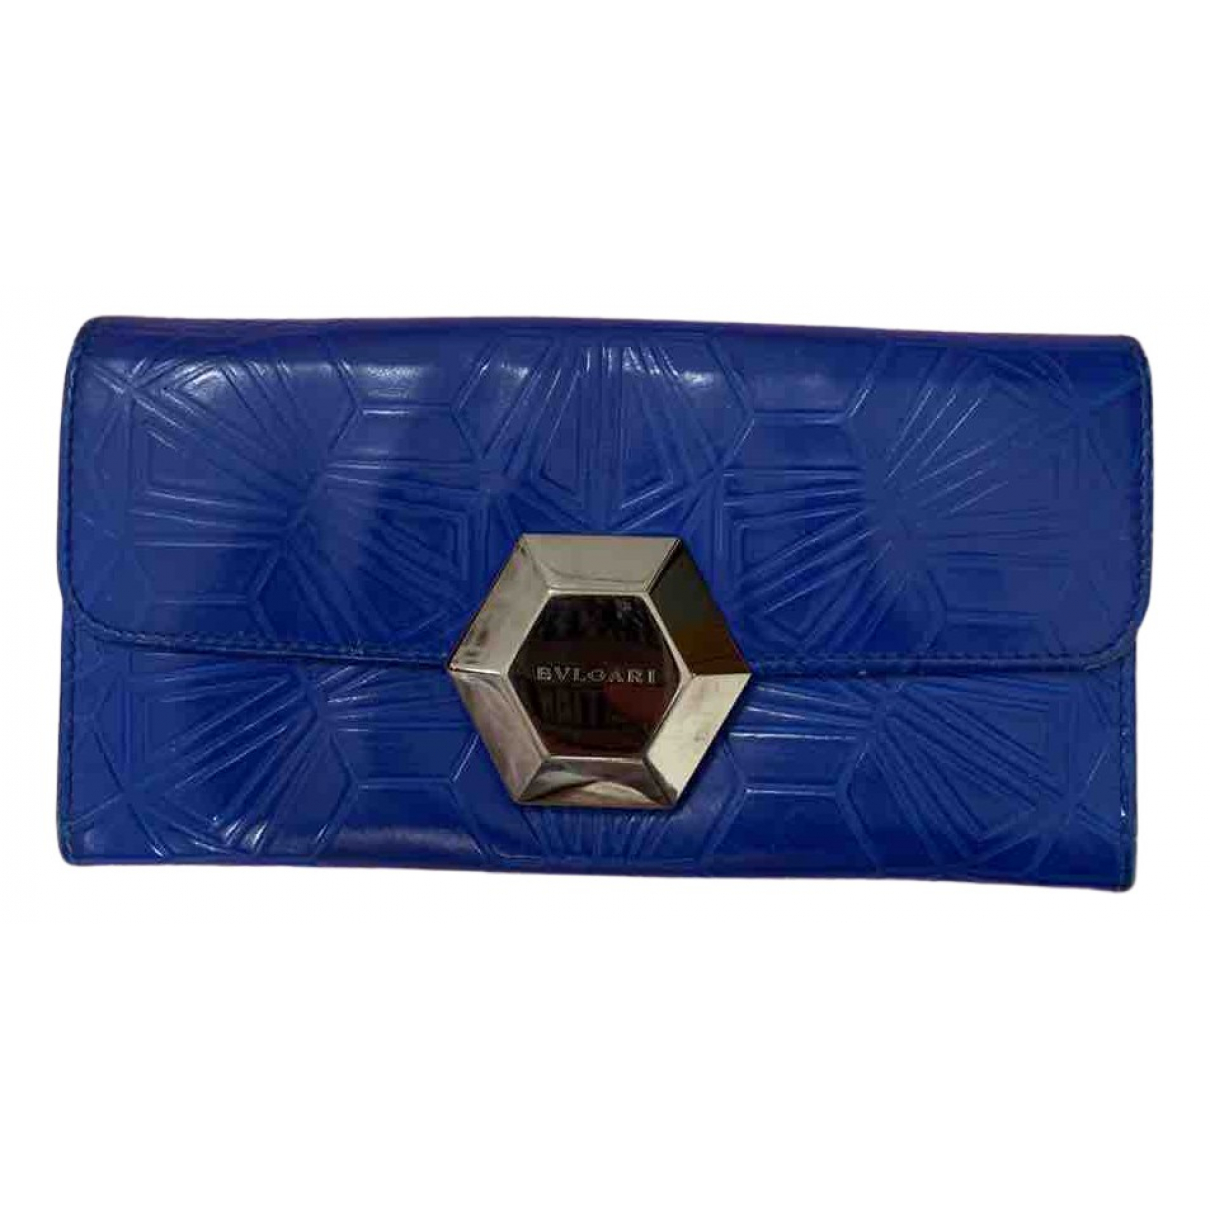 Bvlgari N Blue Leather wallet for Women N